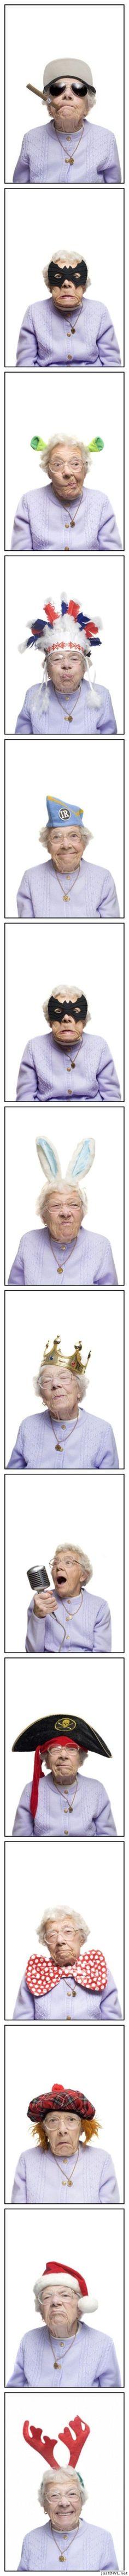 crazy old grandma